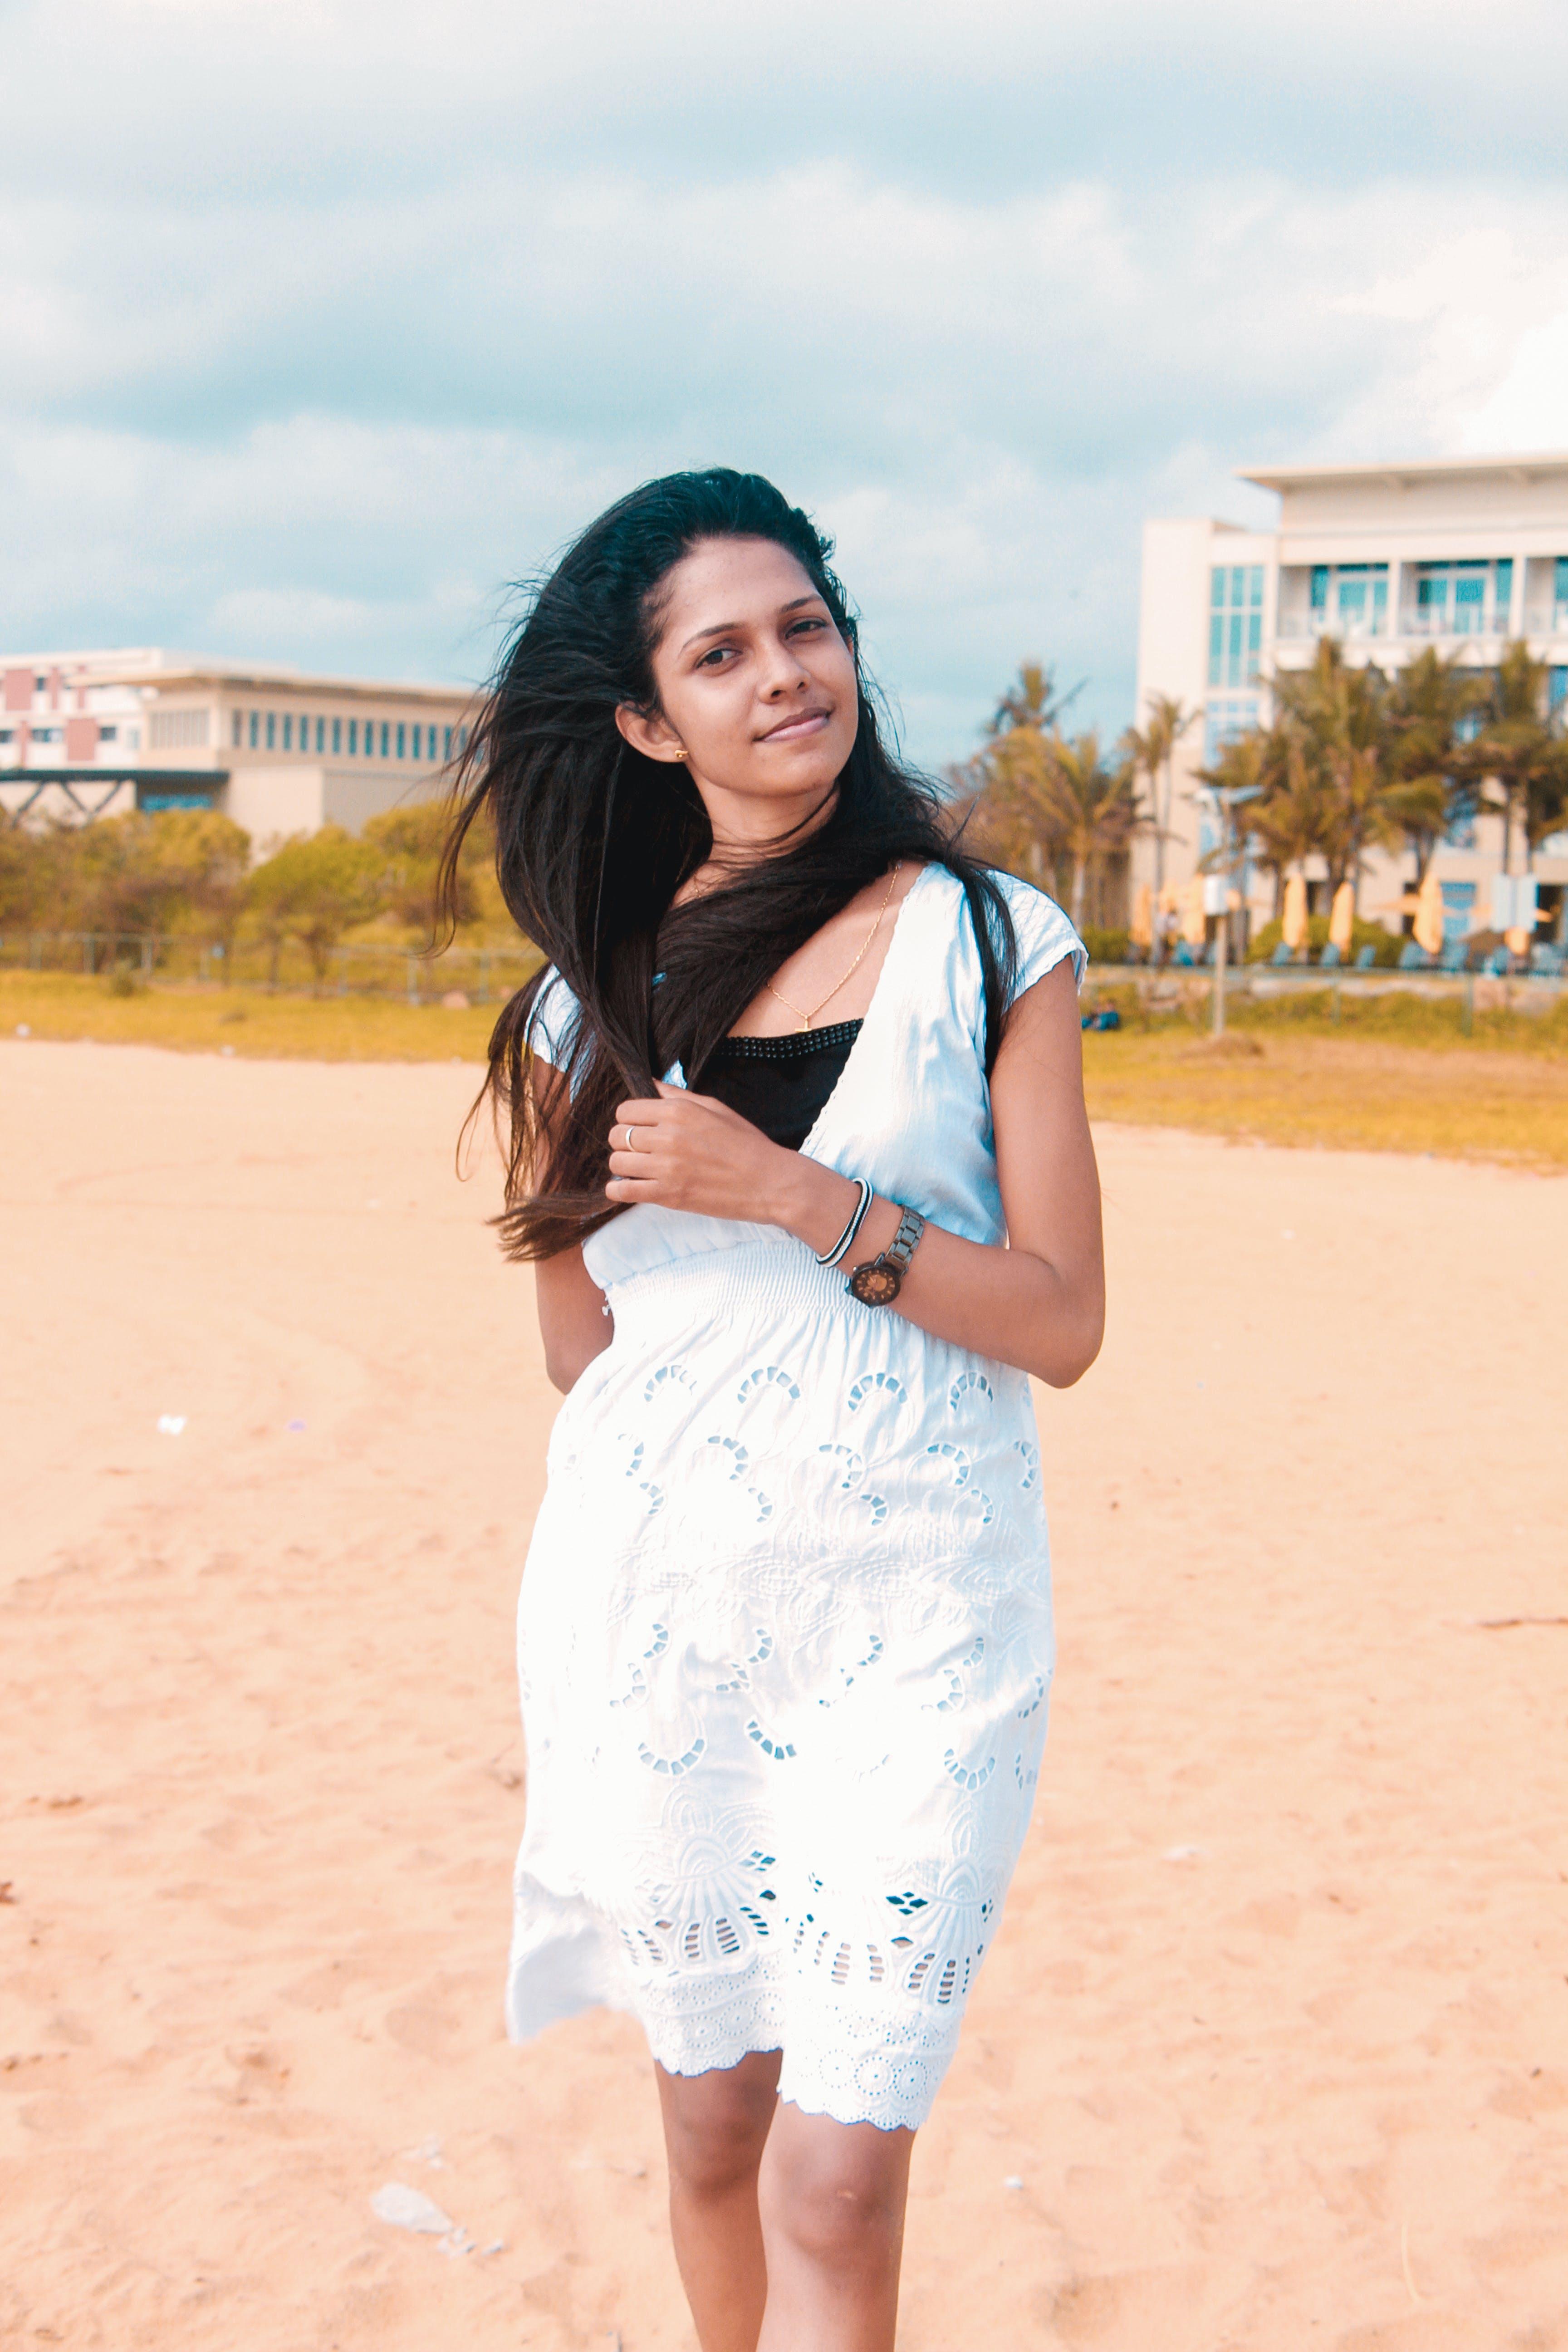 Free stock photo of asian girl, beach, city, girl